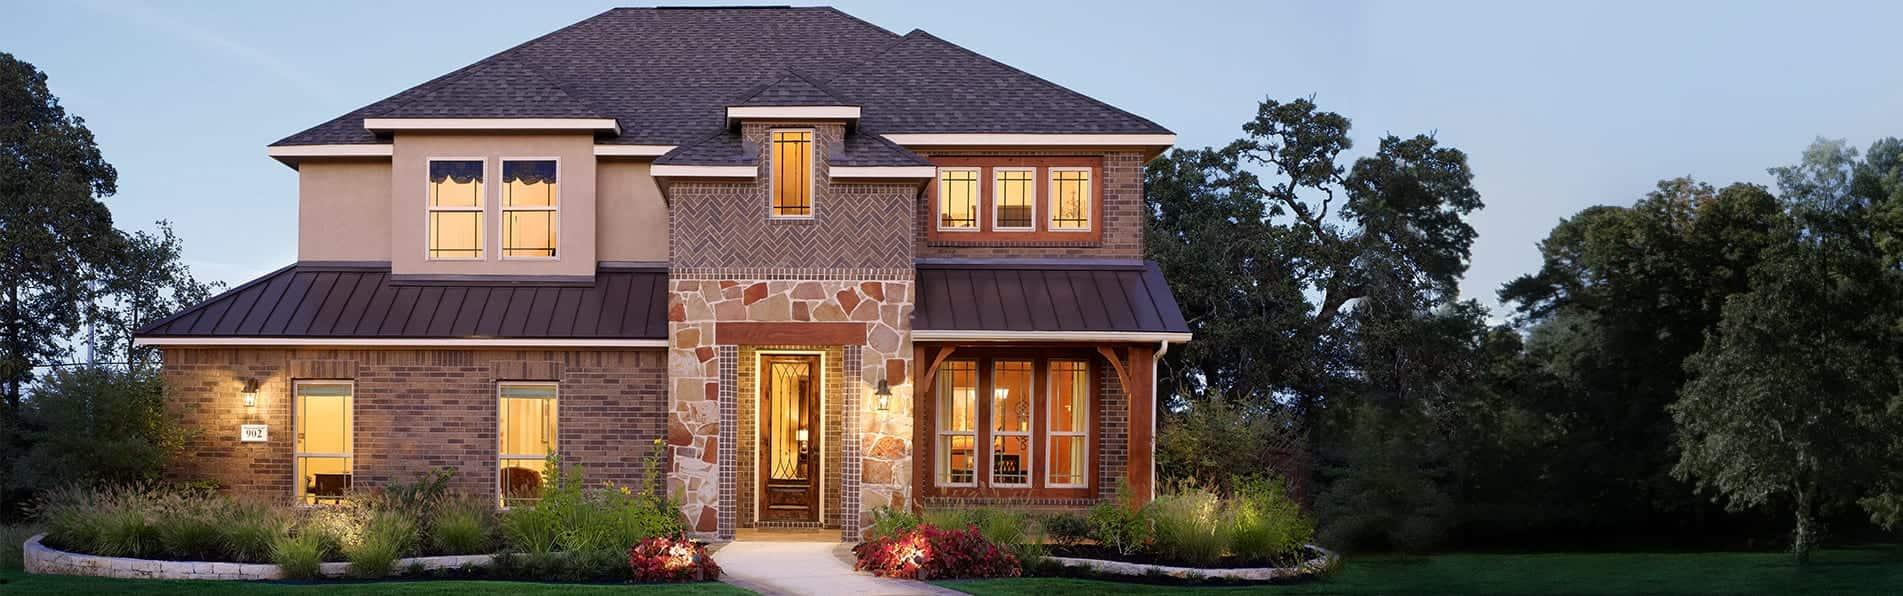 Gehan Homes New Construction Homes In Texas Amp Arizona